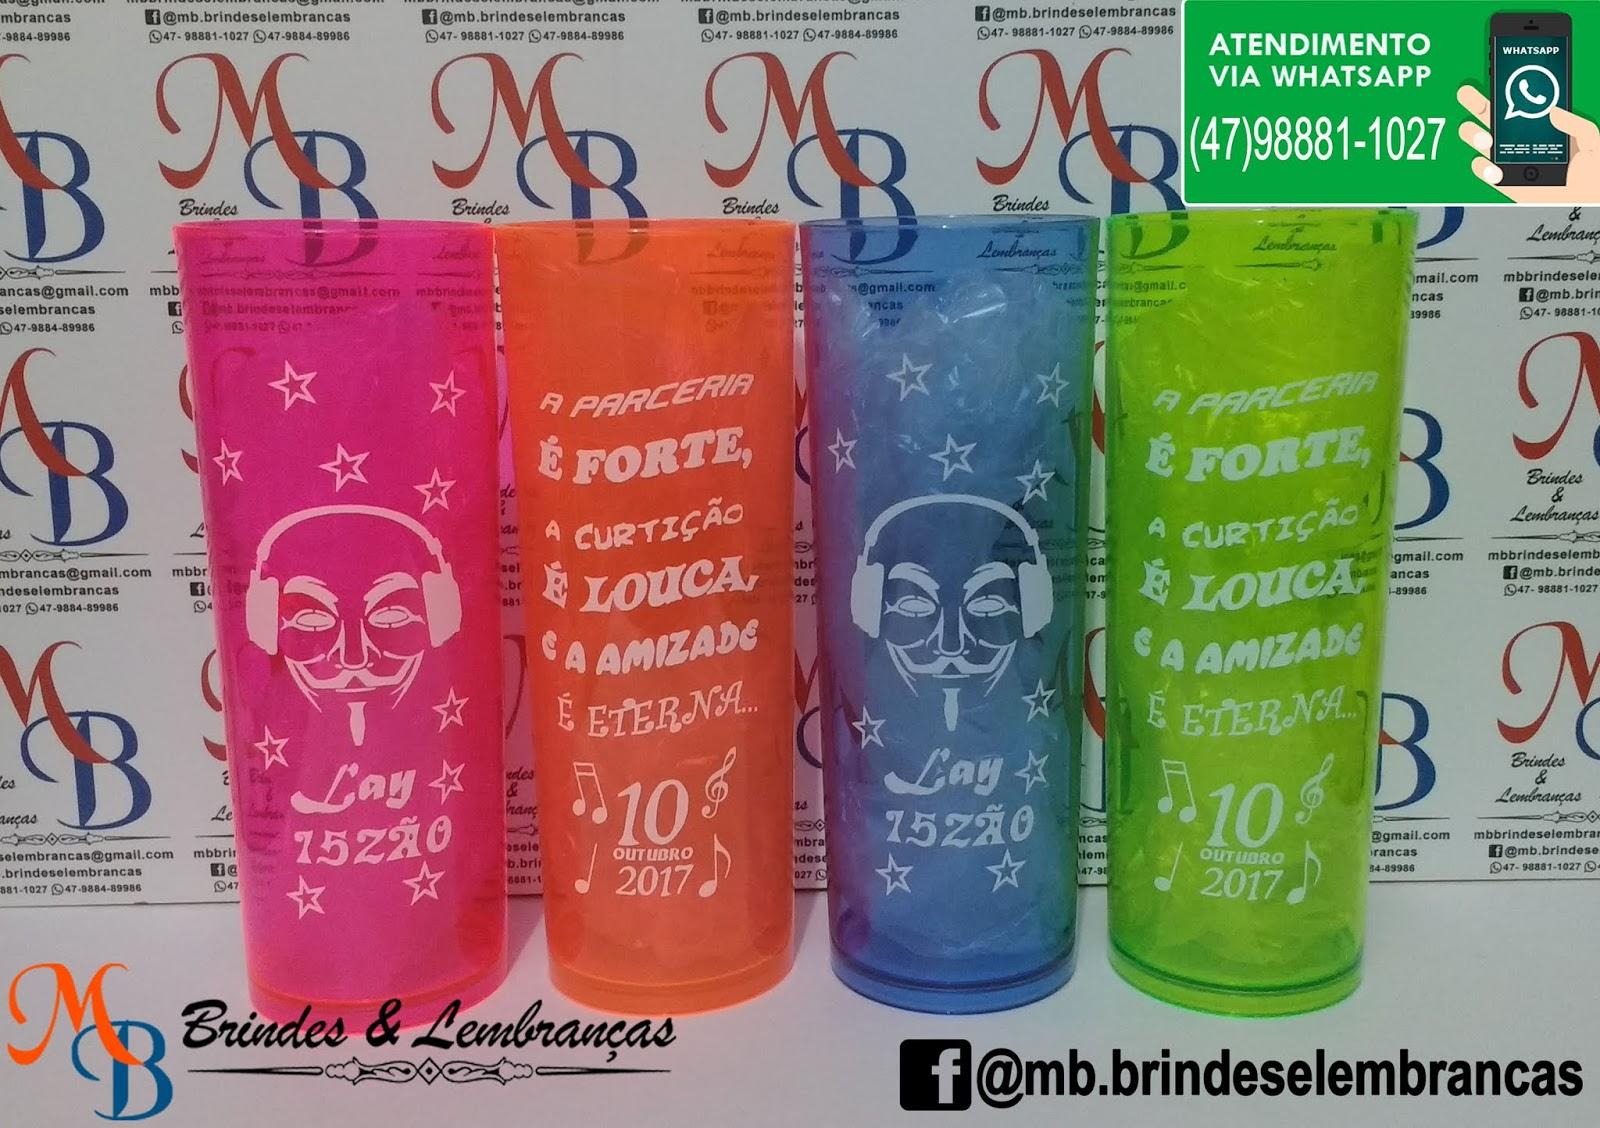 Copos Personalizados Aniversario 15 Anos Joinville Sc Mb Brindes E